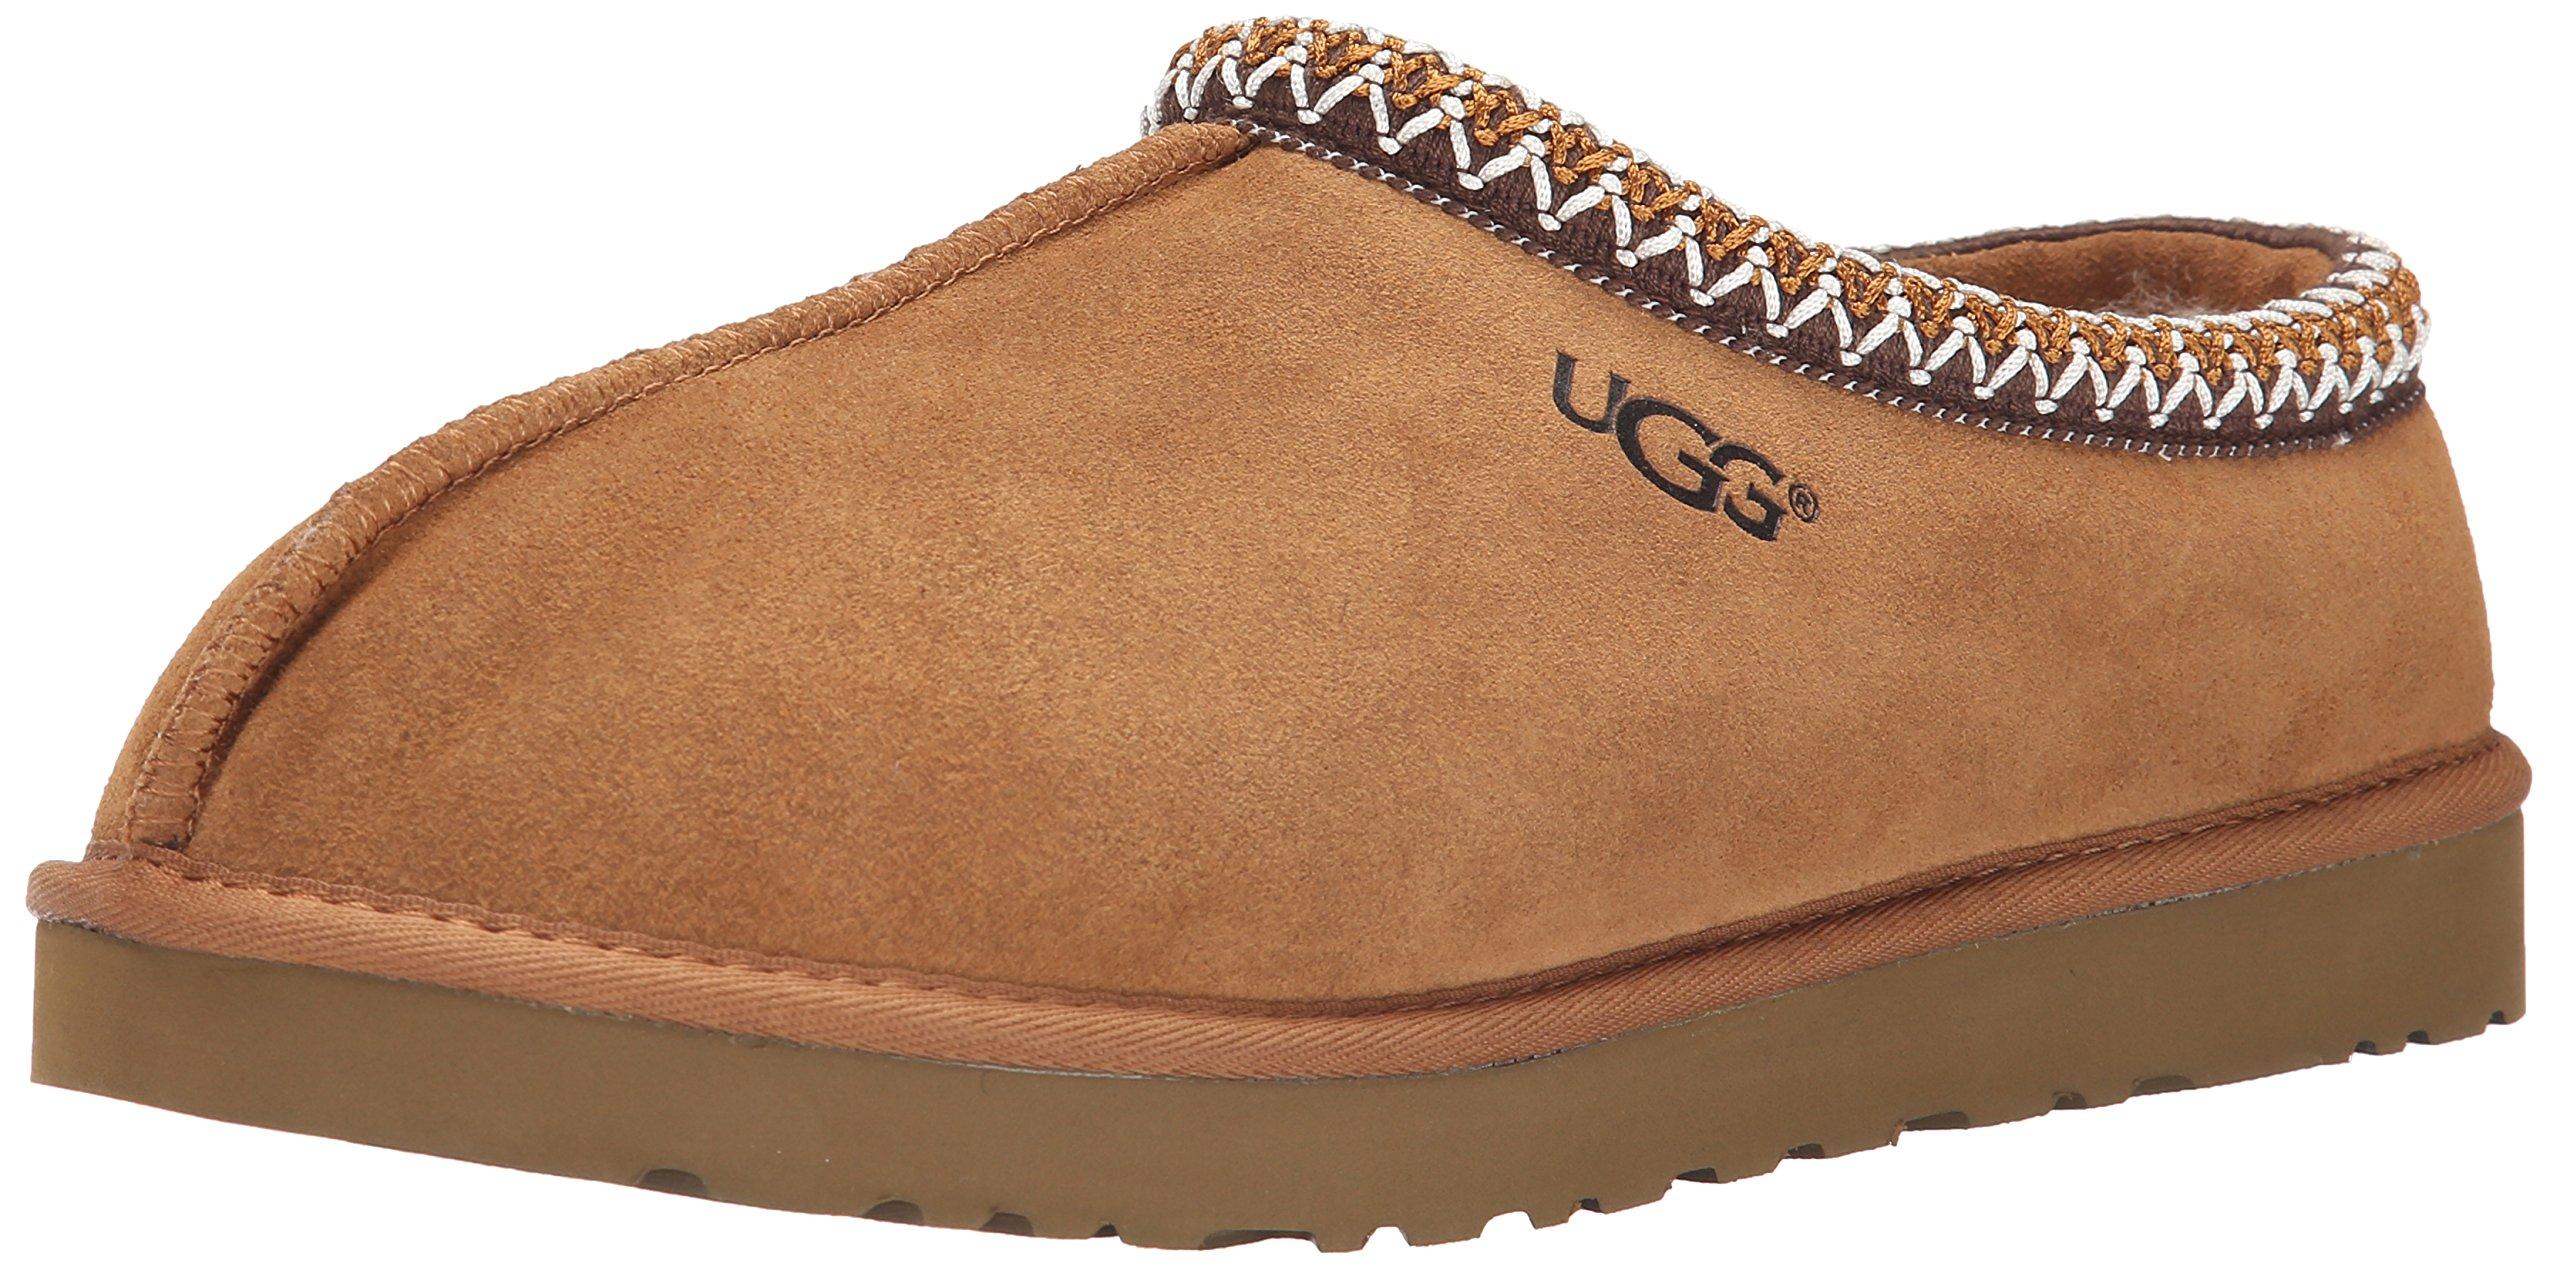 UGG Australia Men's Tasman Chestnut Suede Slippers - 10 D(M) US